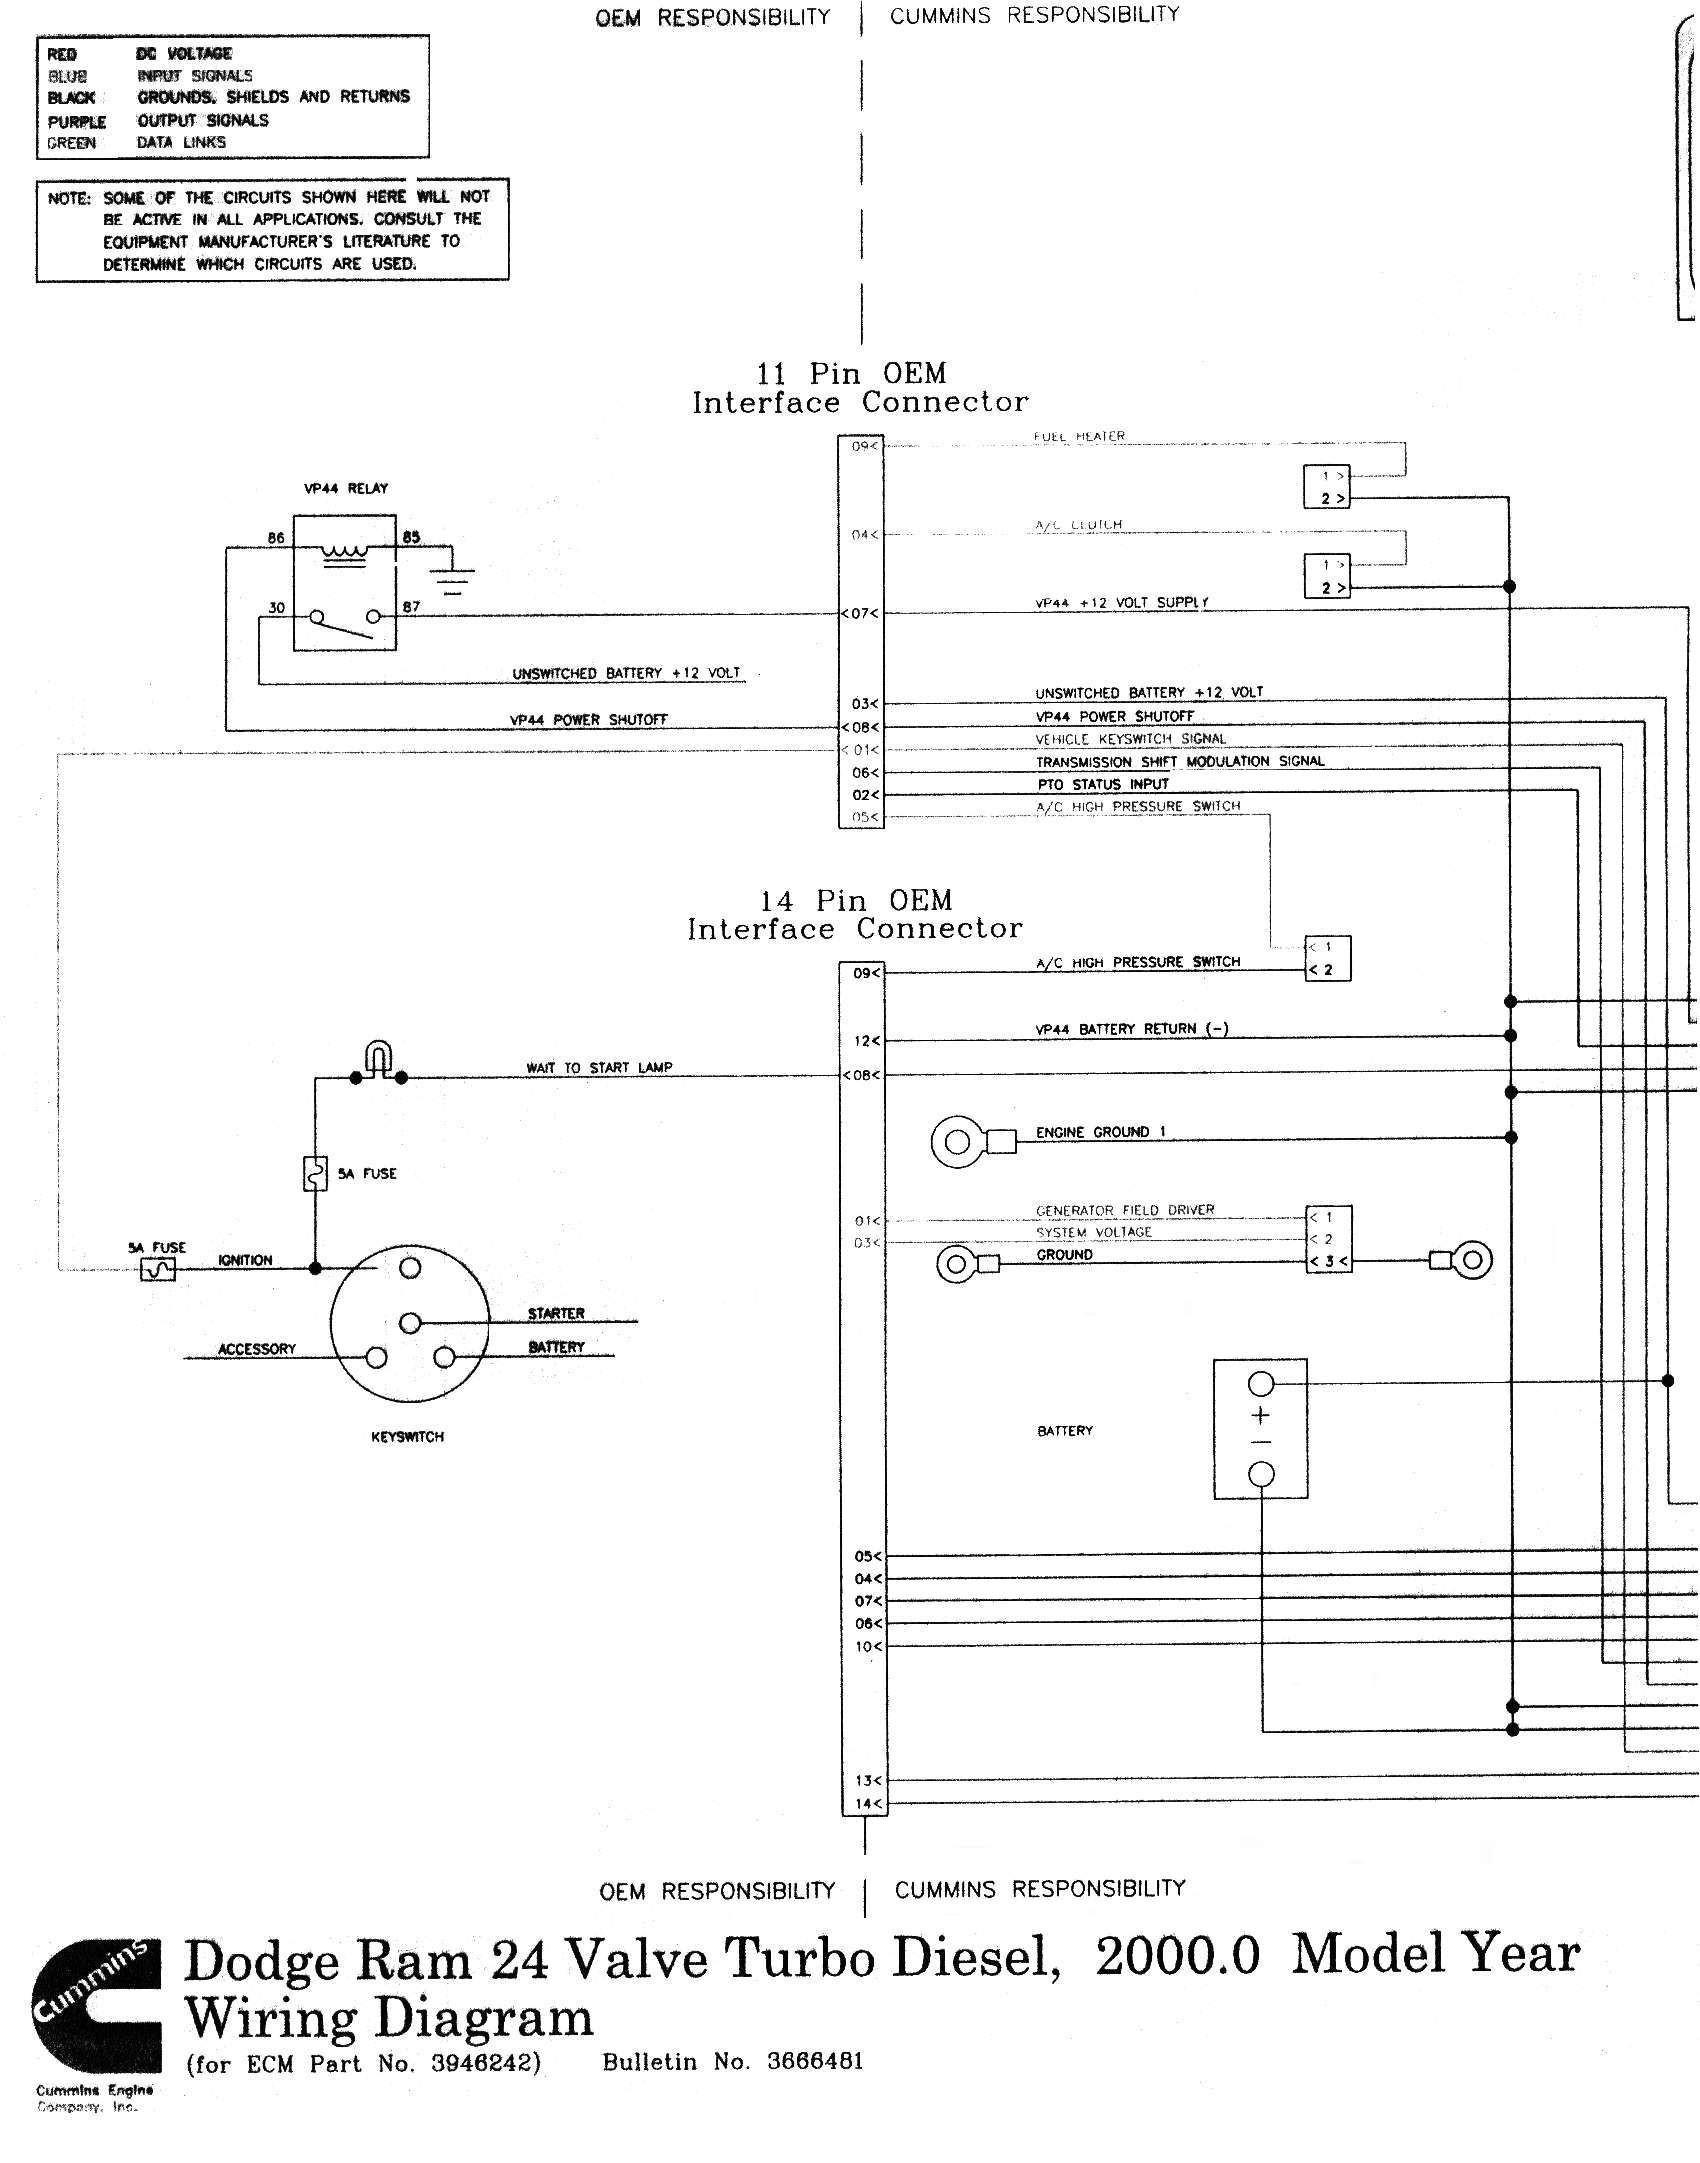 2001 dodge ram pcm wiring diagram - 93 honda civic engine diagram -  7ways.bmw-in-e46.jeanjaures37.fr  wiring diagram resource